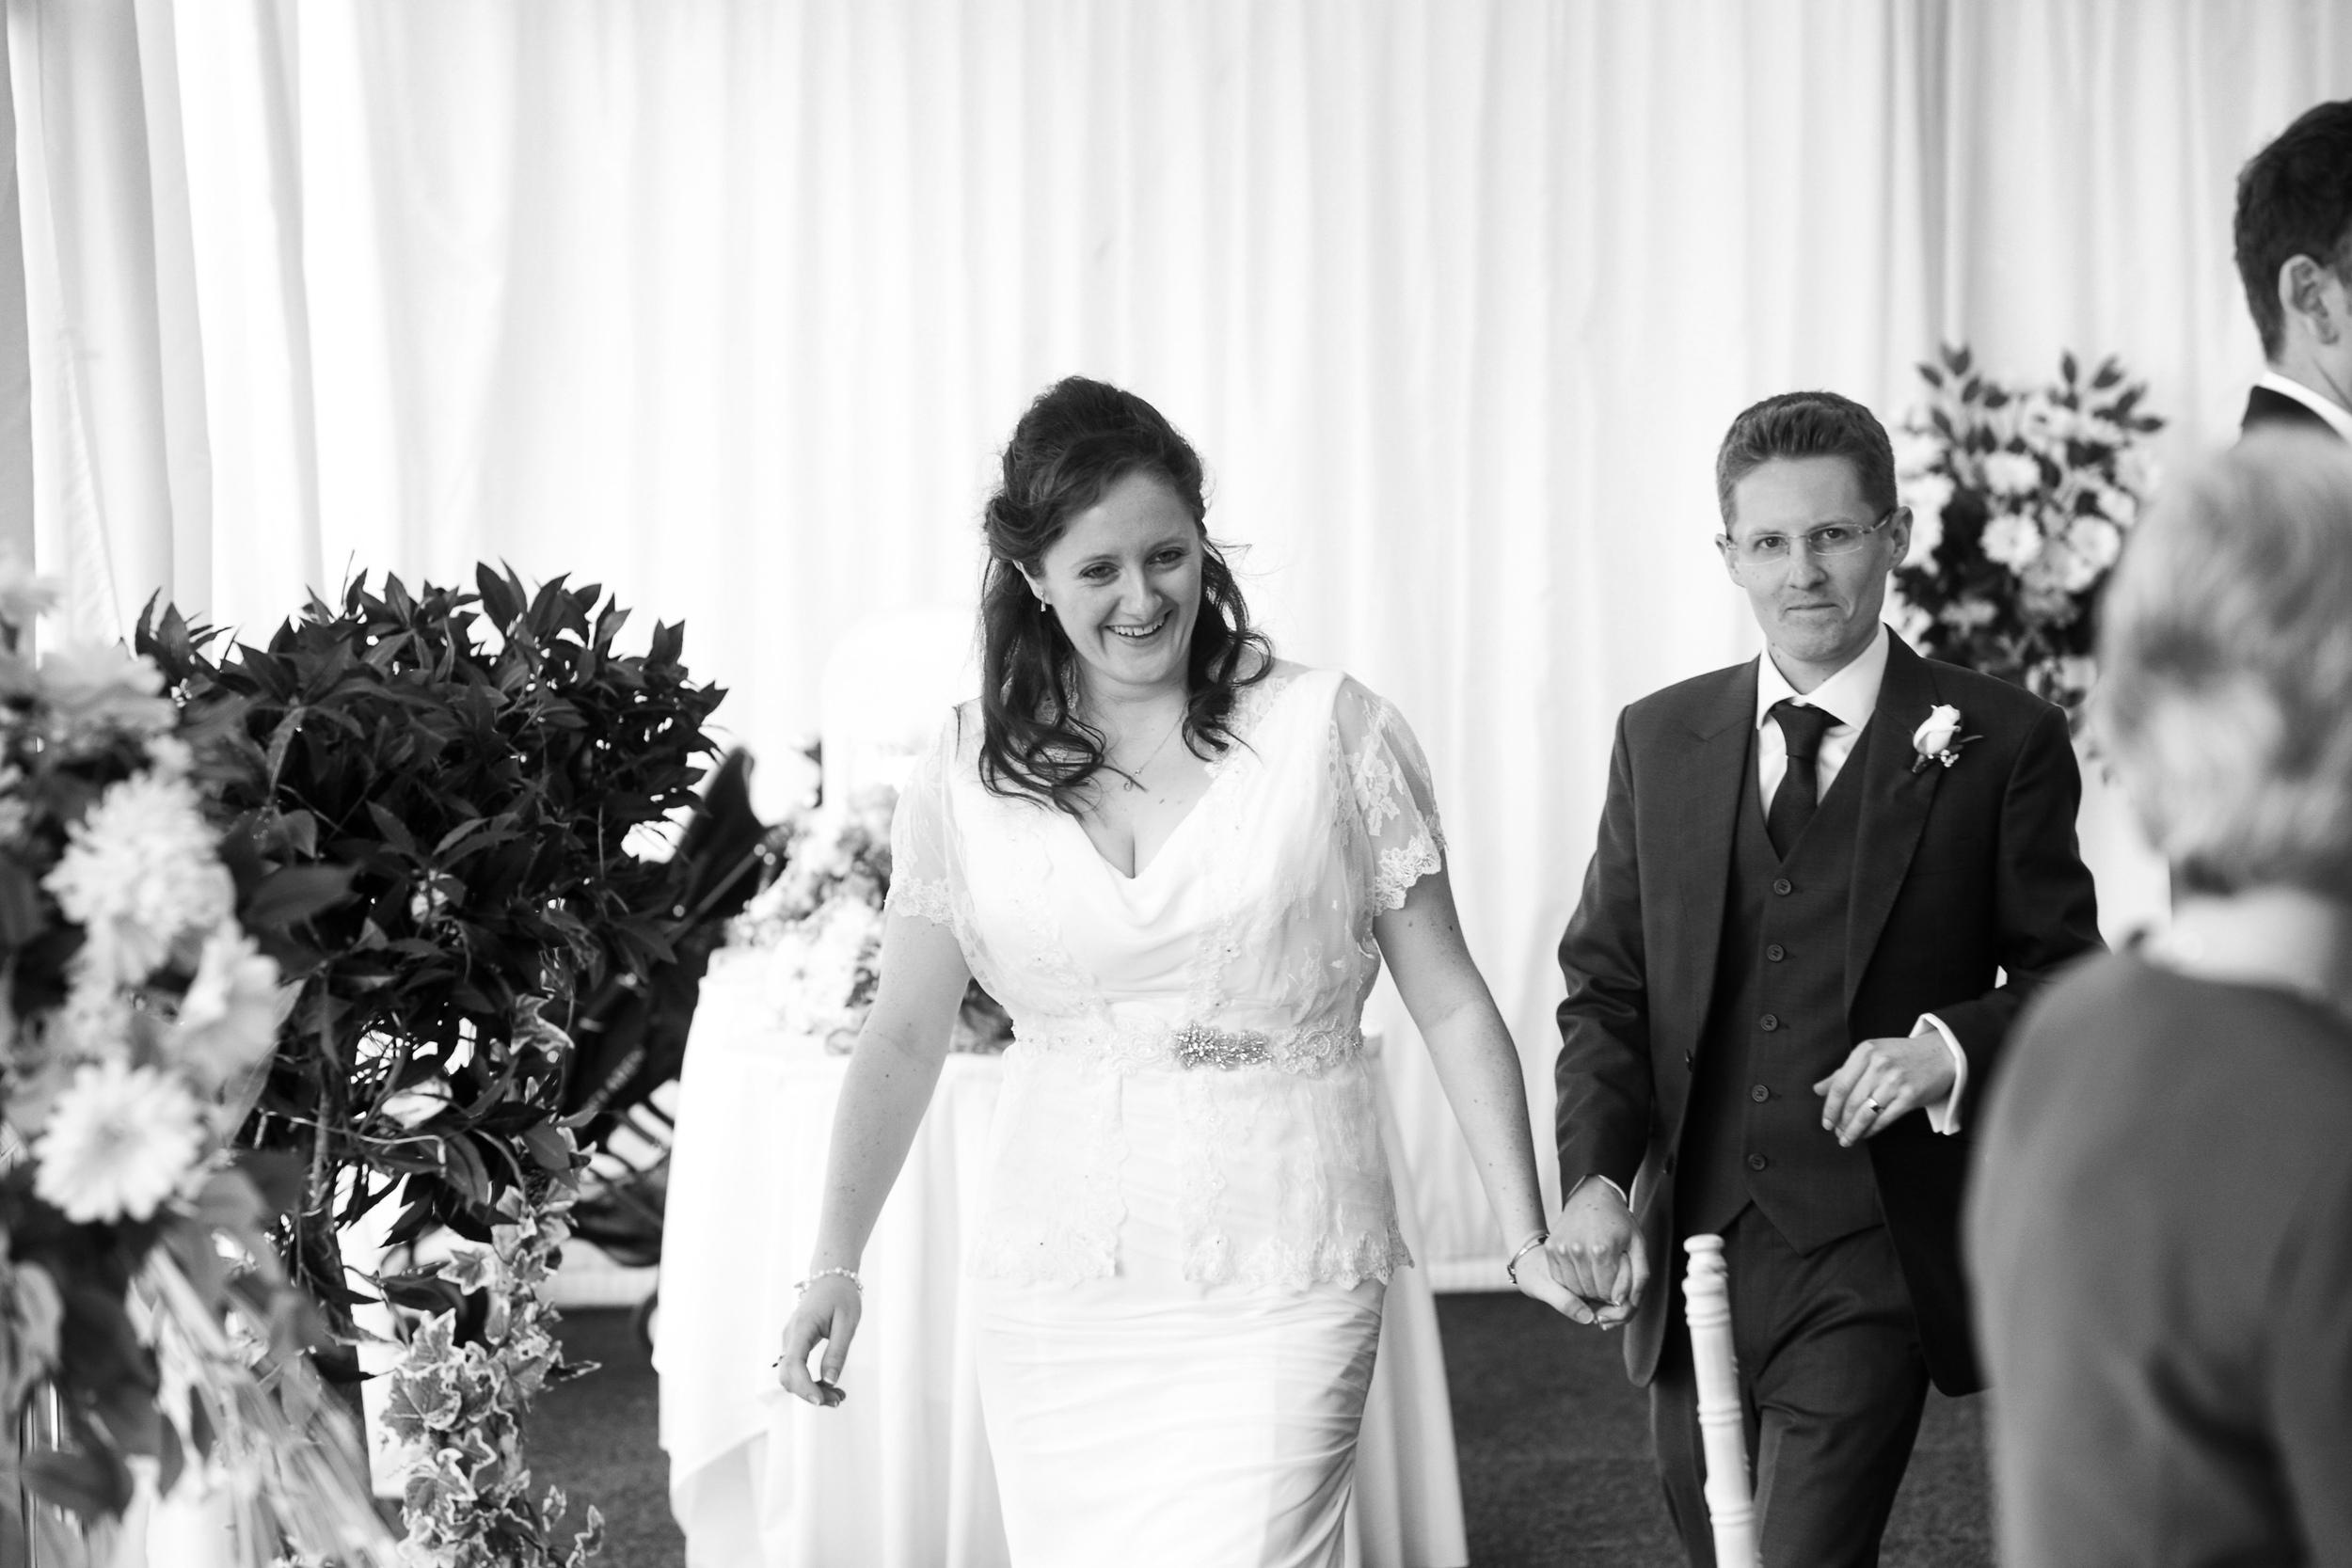 Ocean-View-Gower-Wedding-Photographer-057.JPG